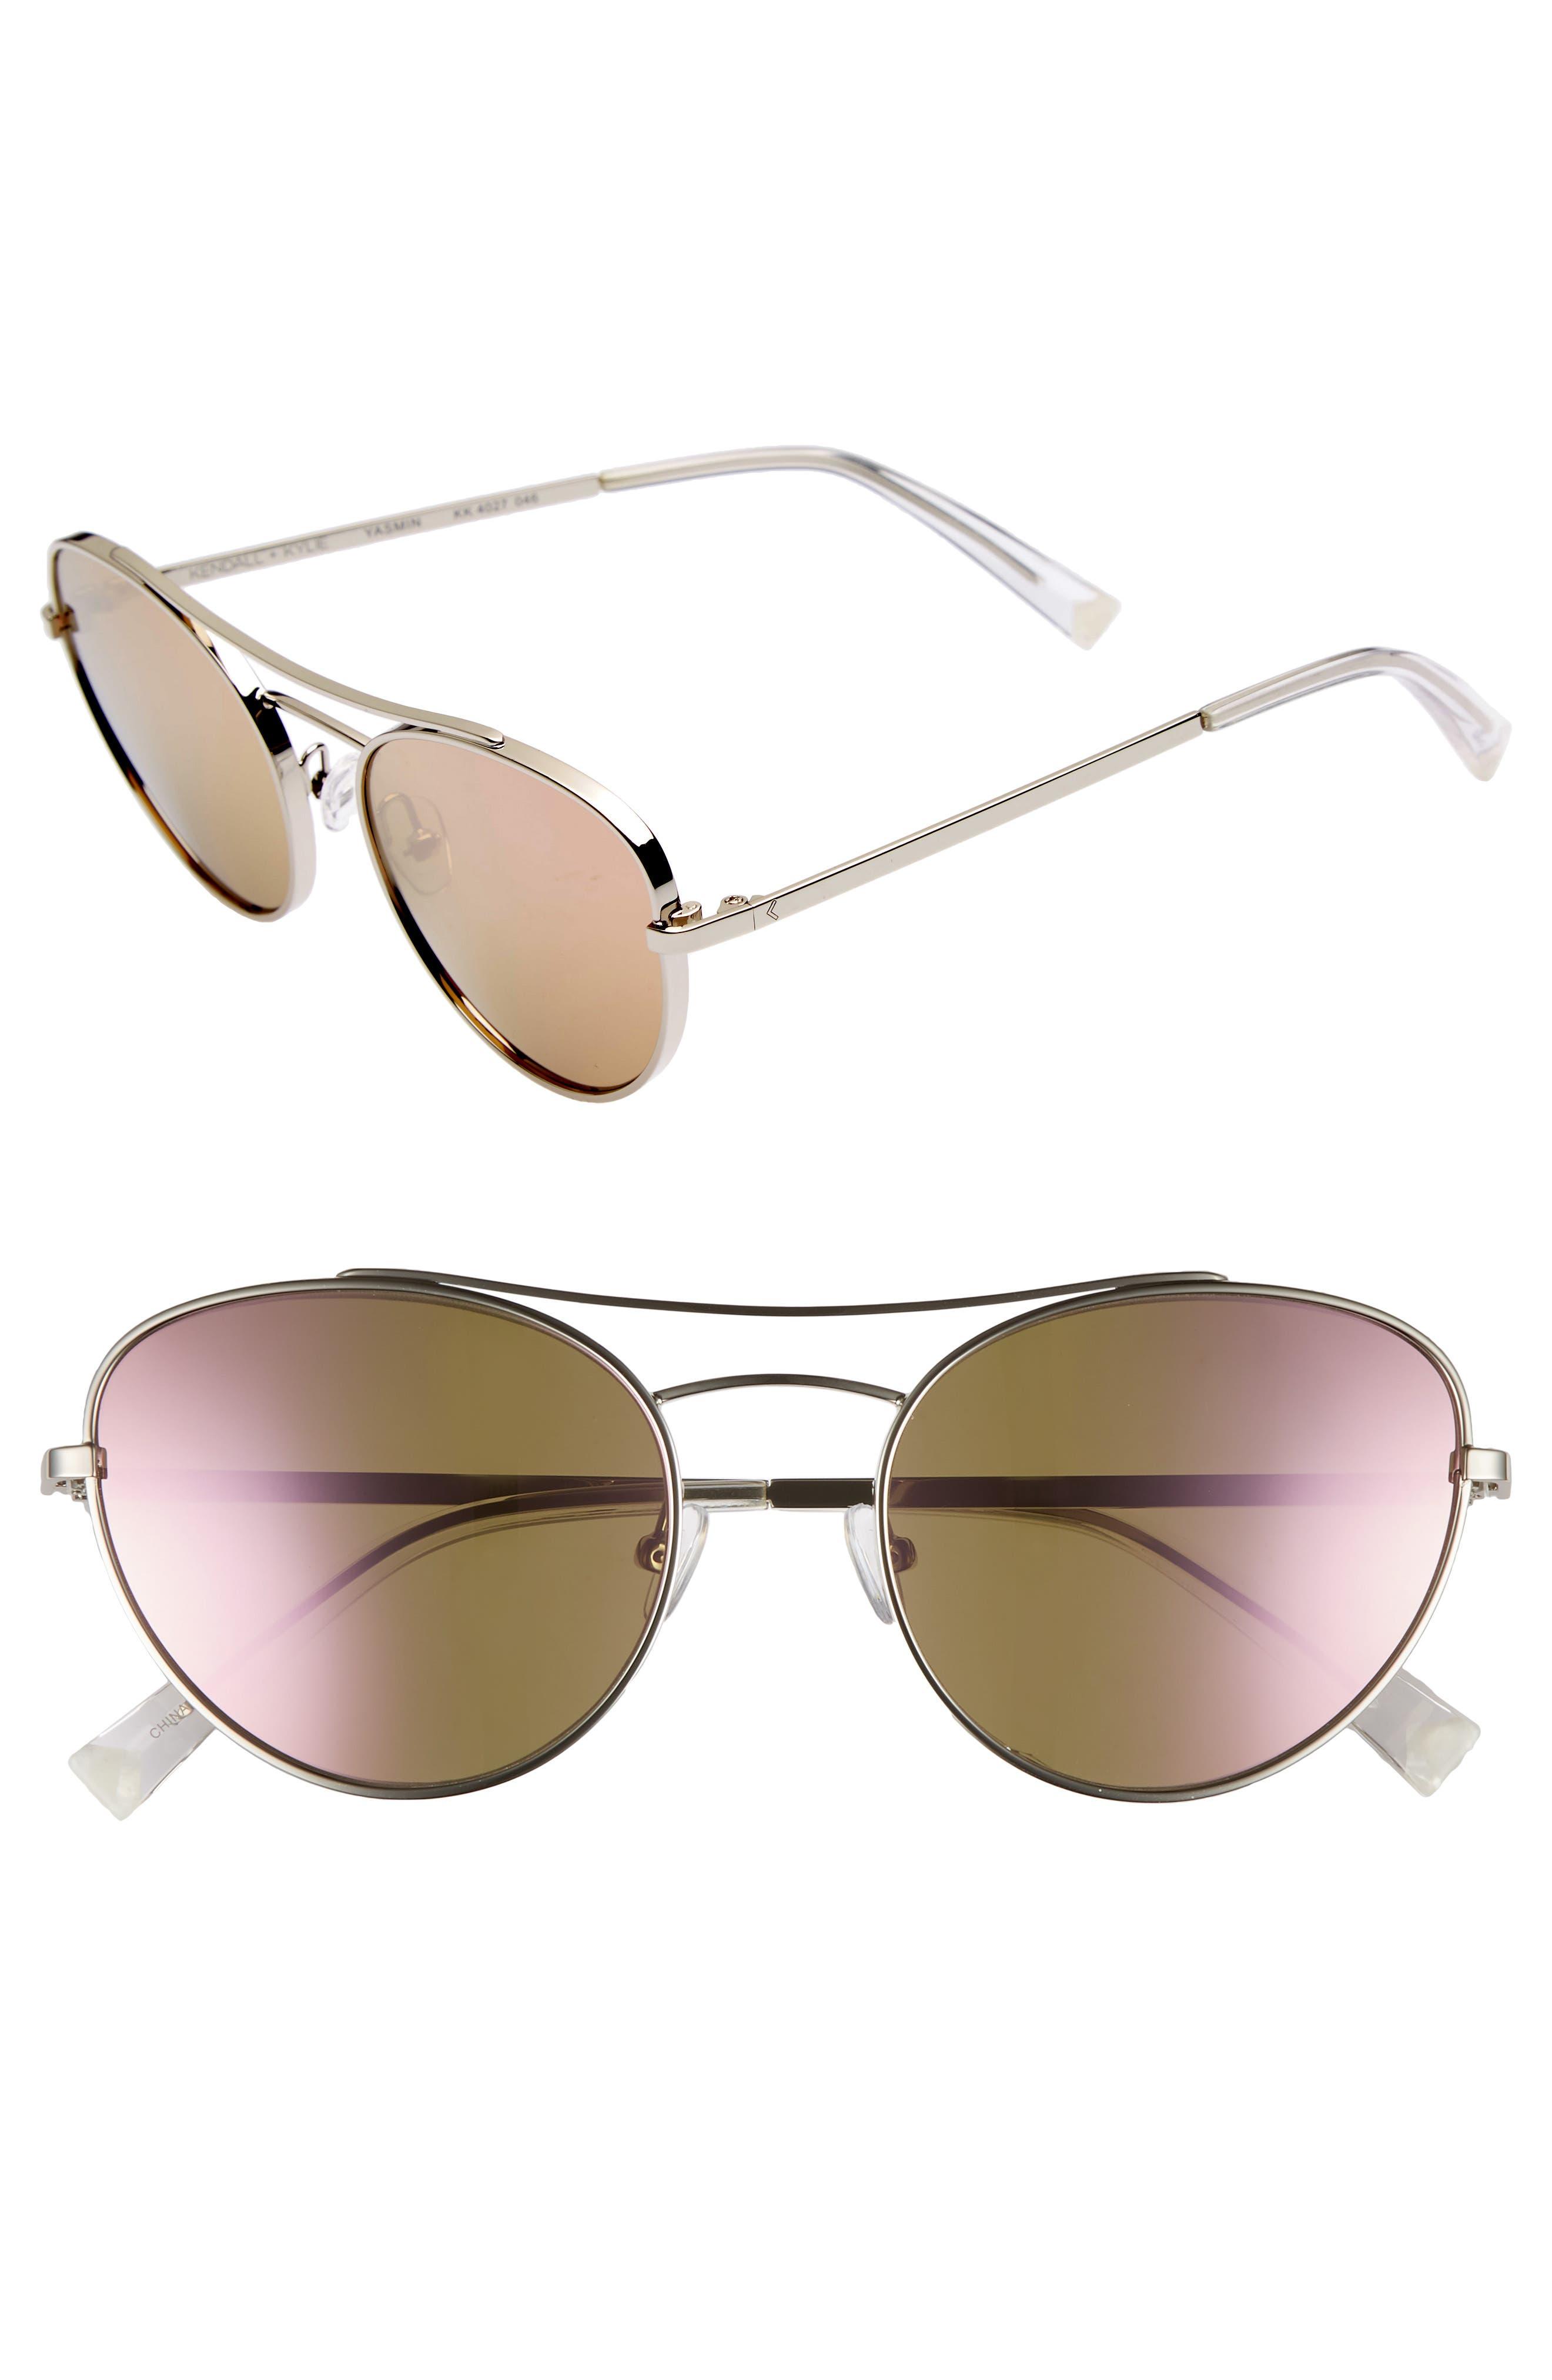 Yasmin 55mm Aviator Sunglasses,                         Main,                         color, Silver/ Rose Gold Mirror